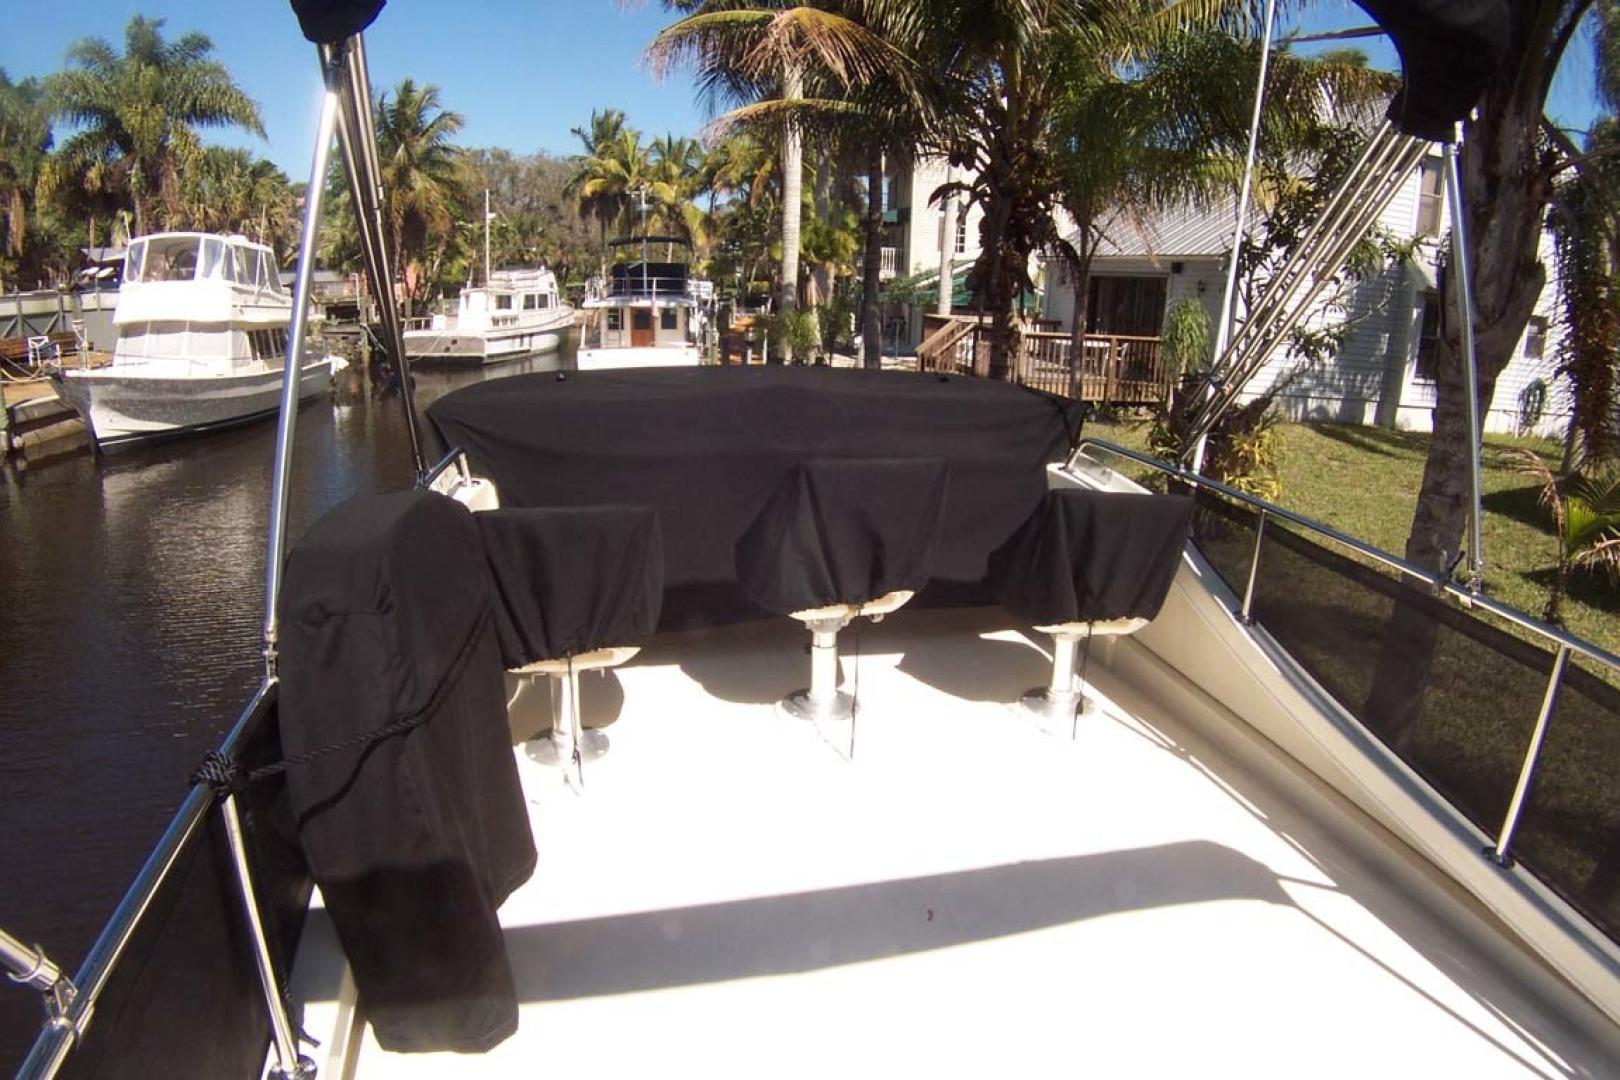 Camano-Troll 2007-NEXT ADVENTURE Stuart-Florida-United States Helm and Chair Sunbrella Coverings-1622021   Thumbnail